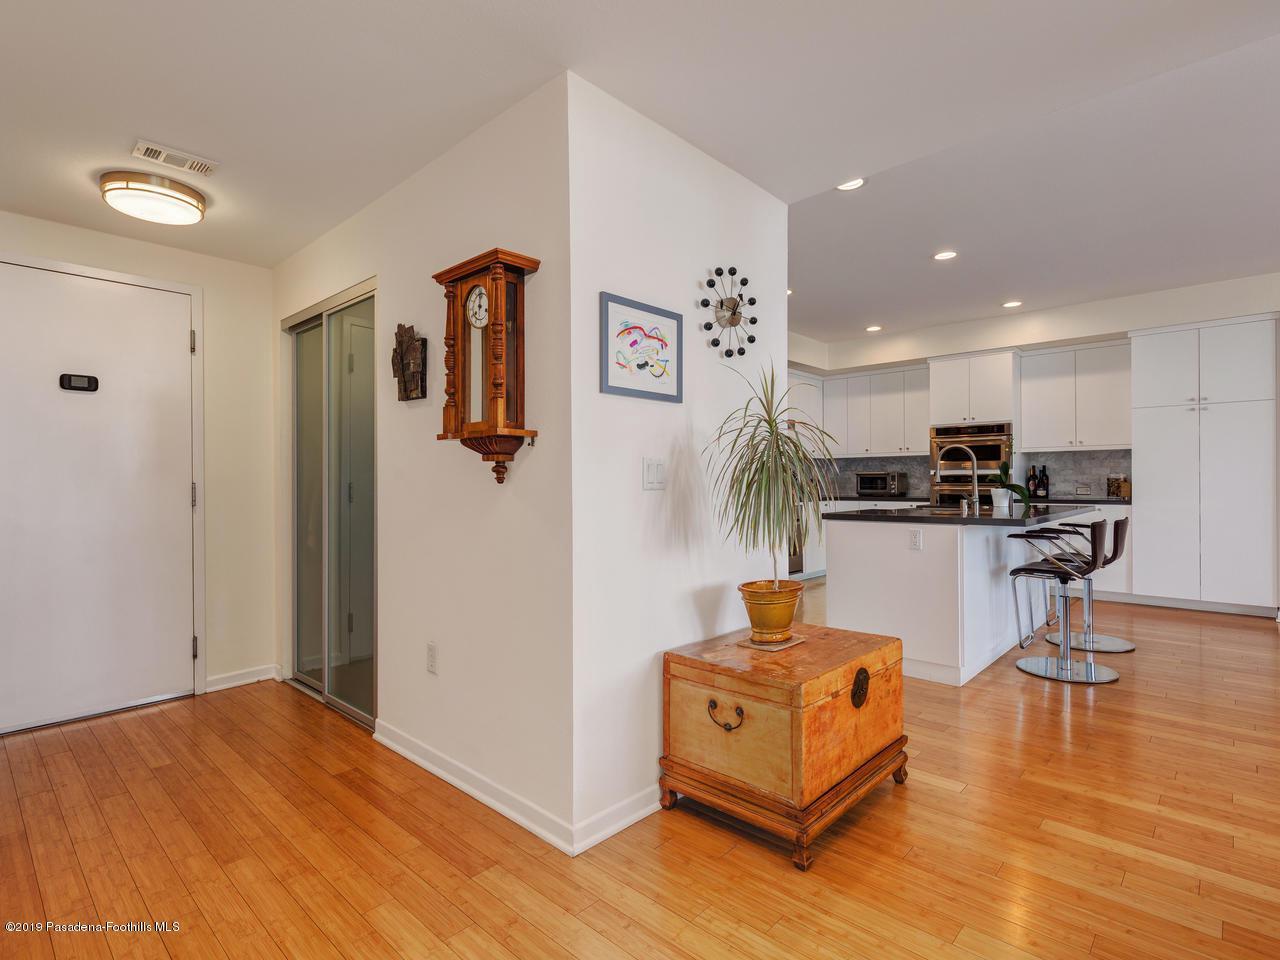 111 DE LACEY, Pasadena, CA 91105 - Foyer/Kitchen